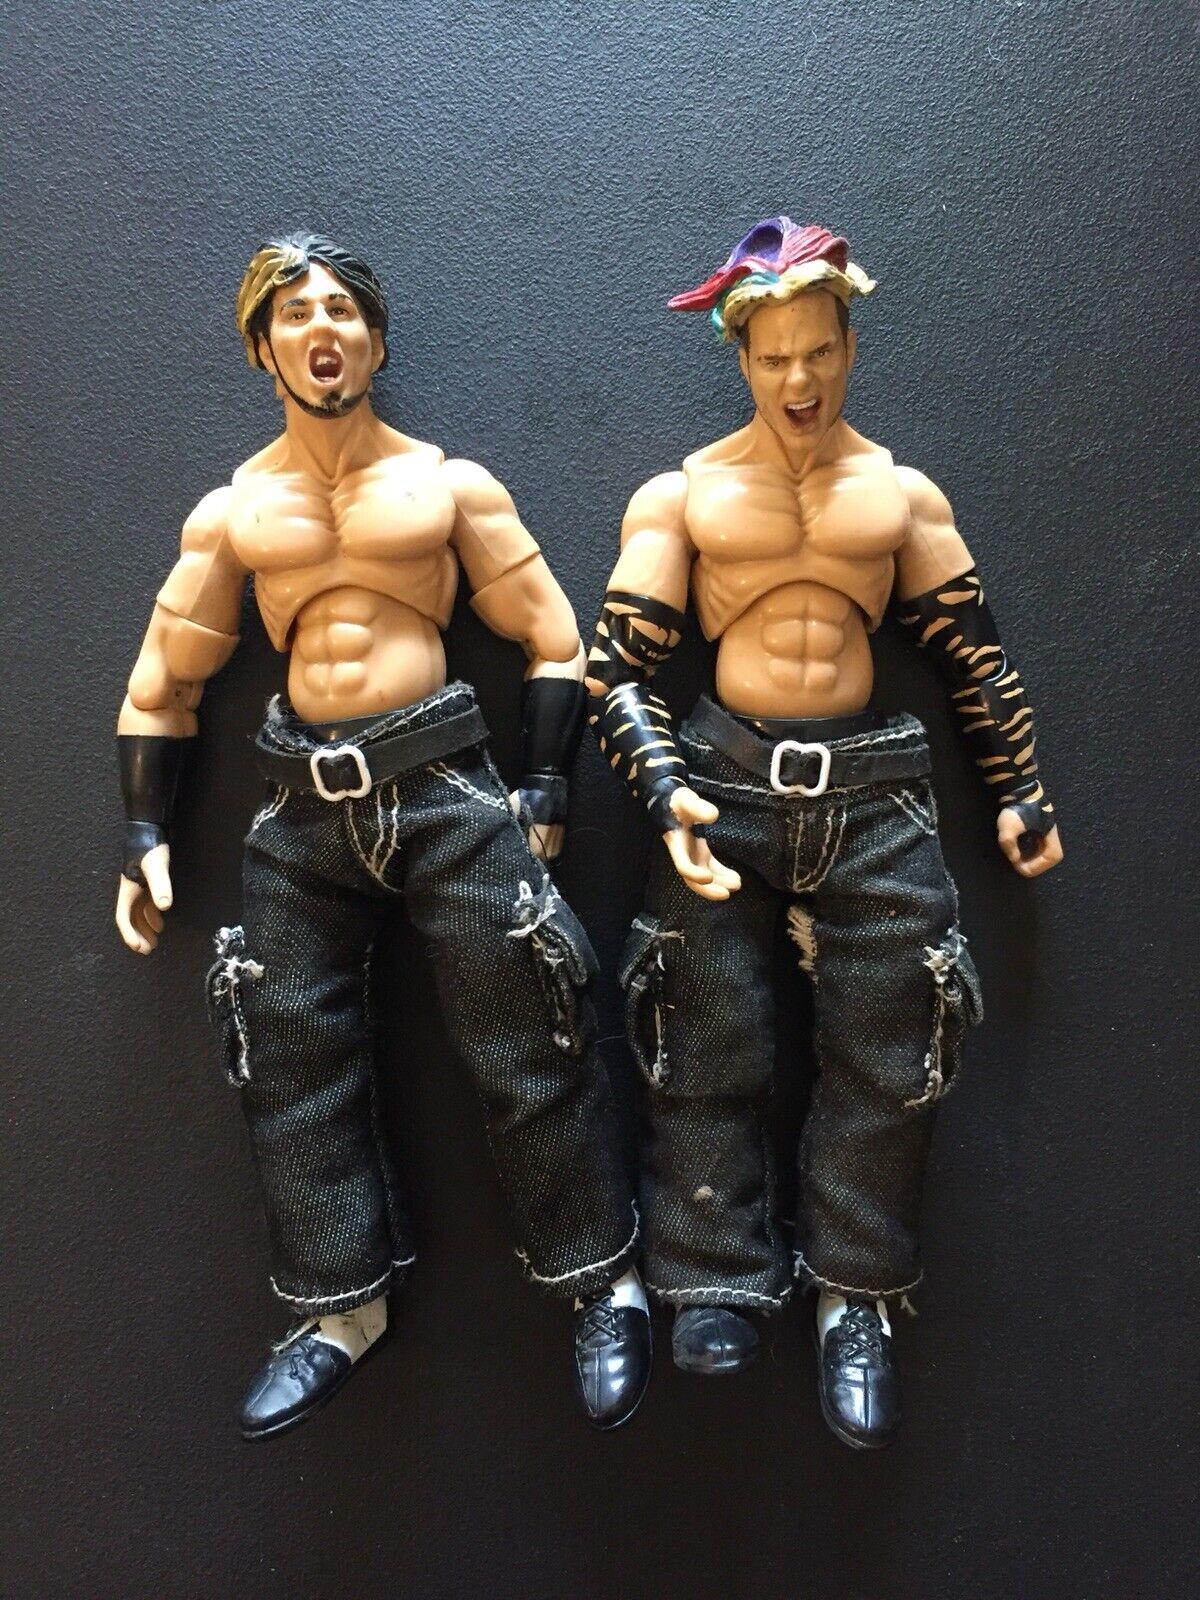 Rare Jakks Pacific WWF Wrestling Hardy Boyz Finishing Moves Series Set Of 2